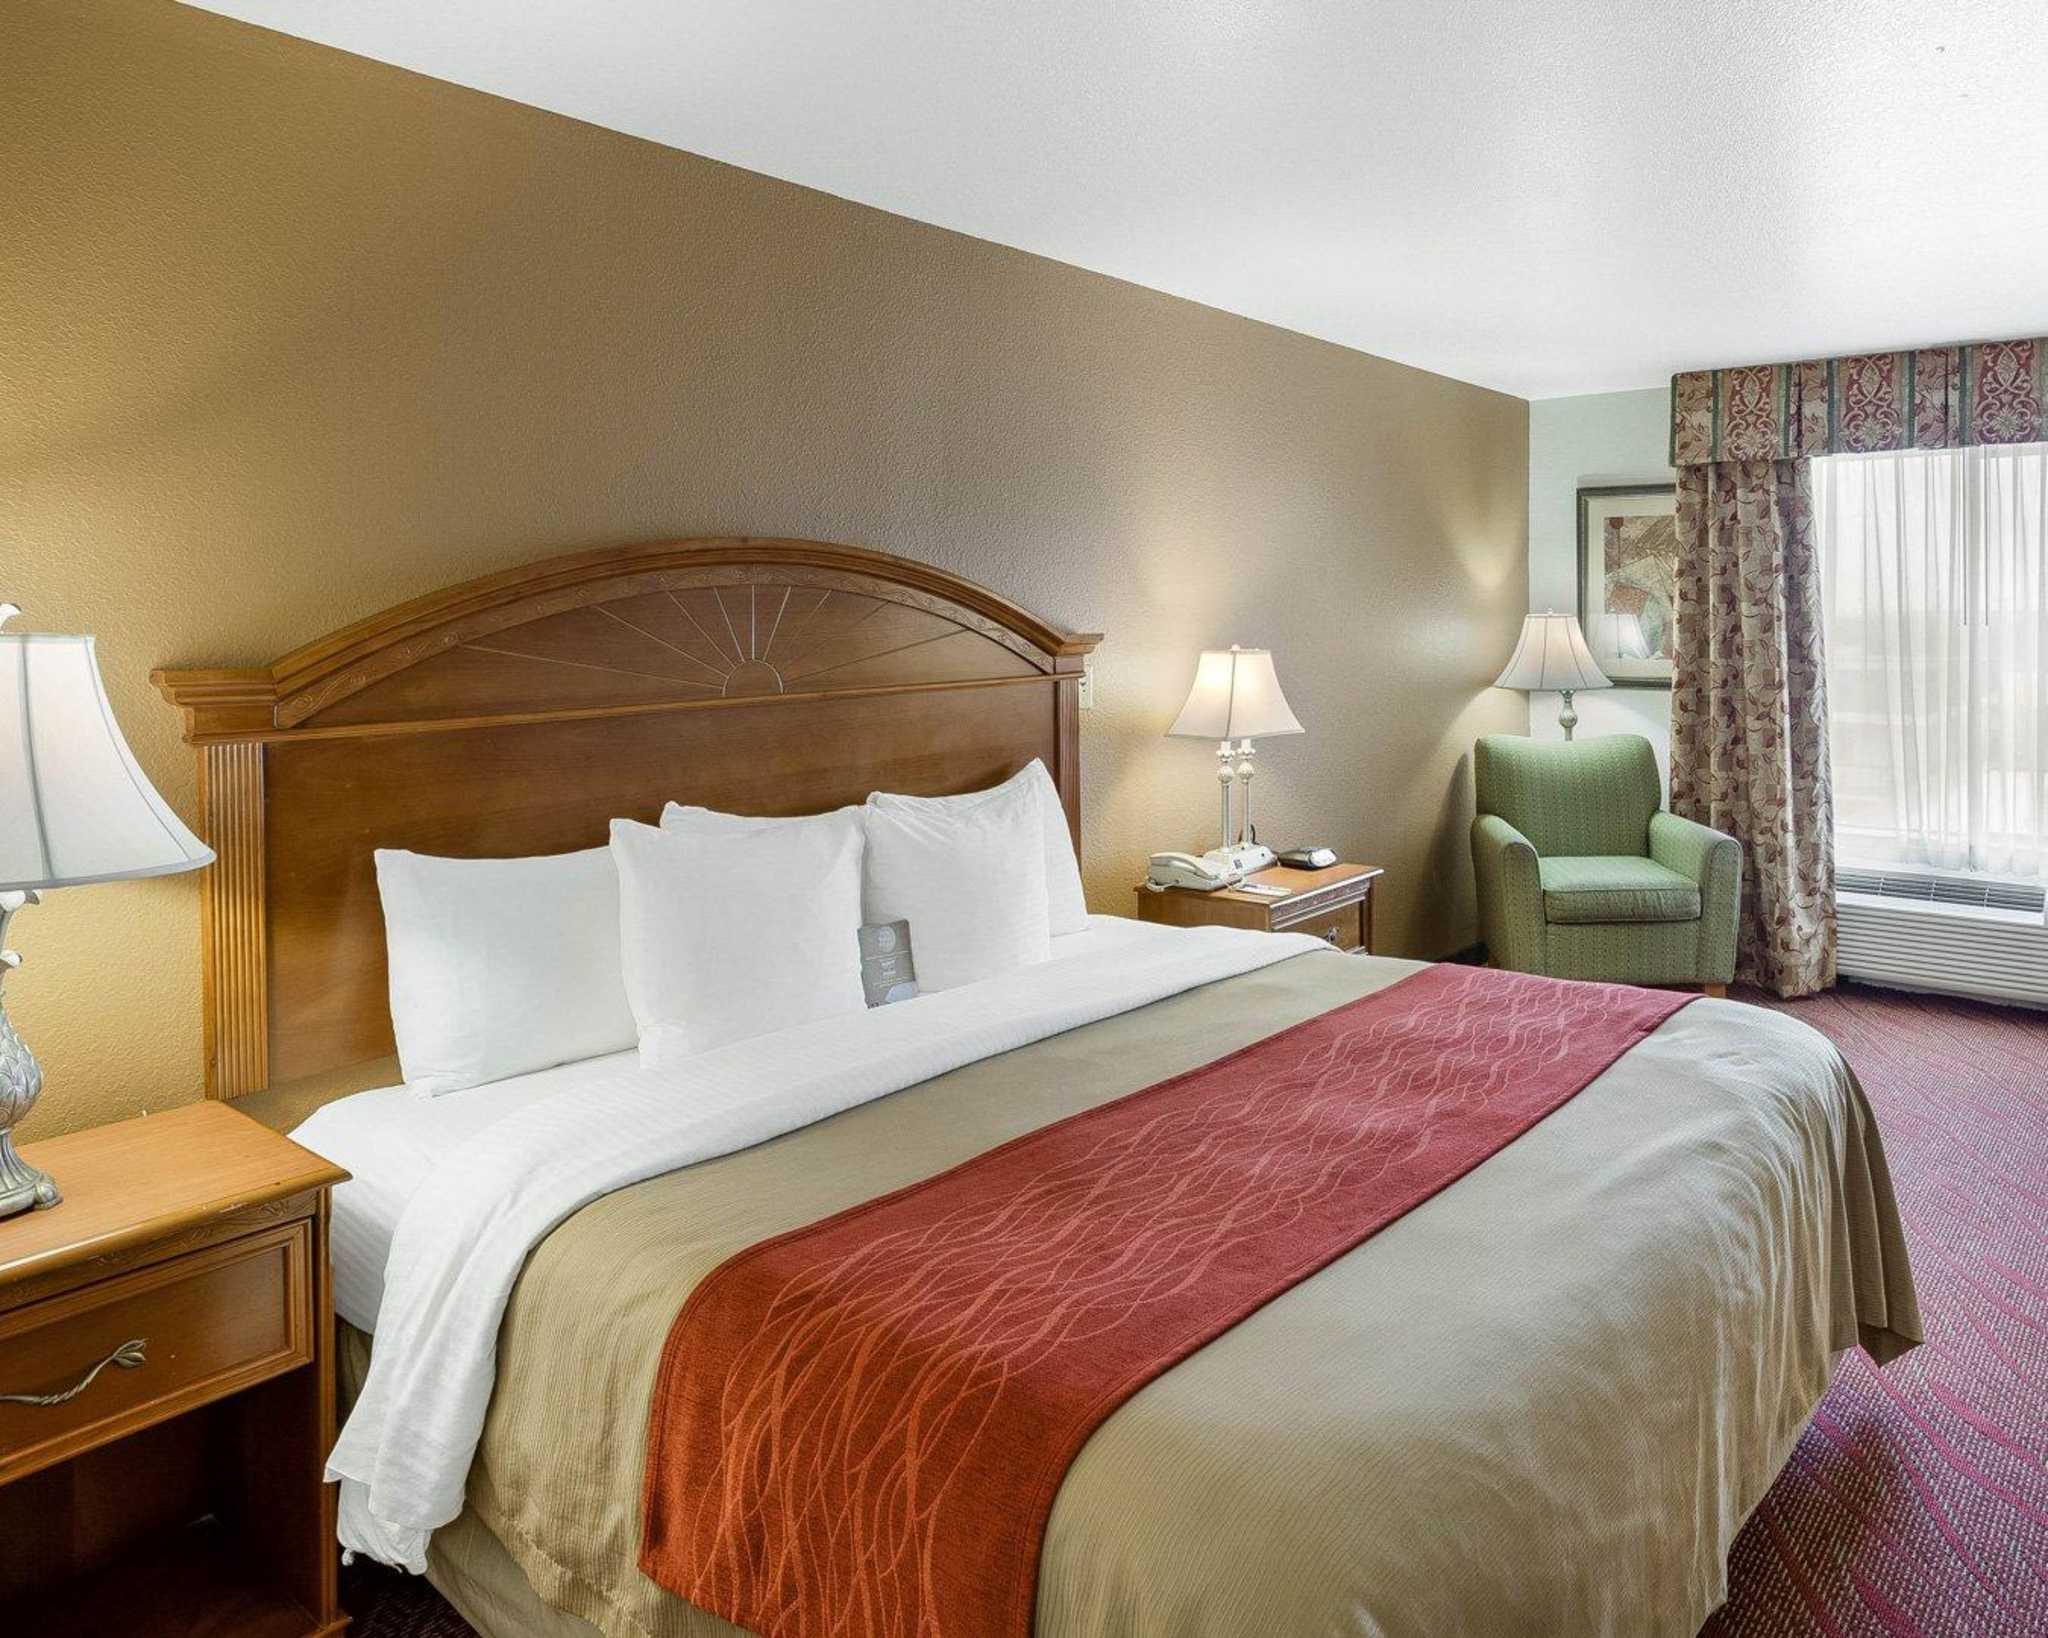 Comfort Inn & Suites Near Medical Center image 5